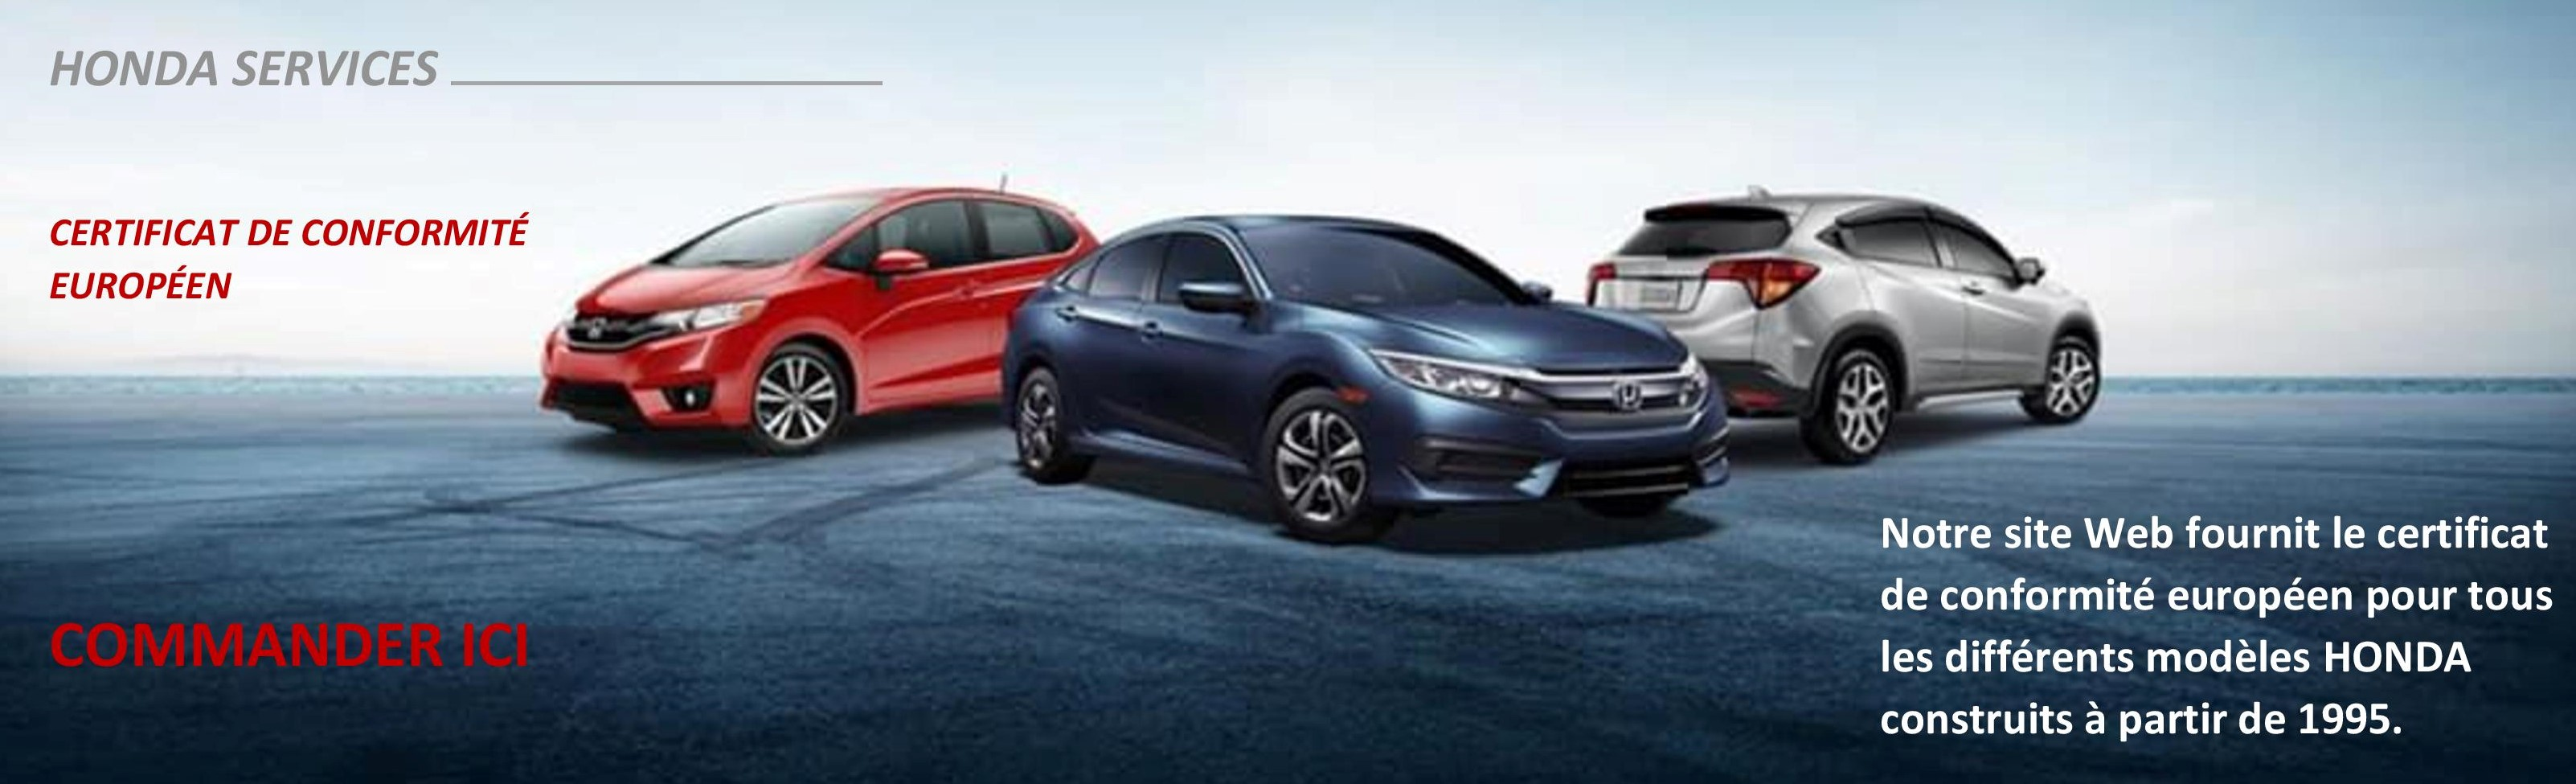 Obtenir le certificat de conformité Honda